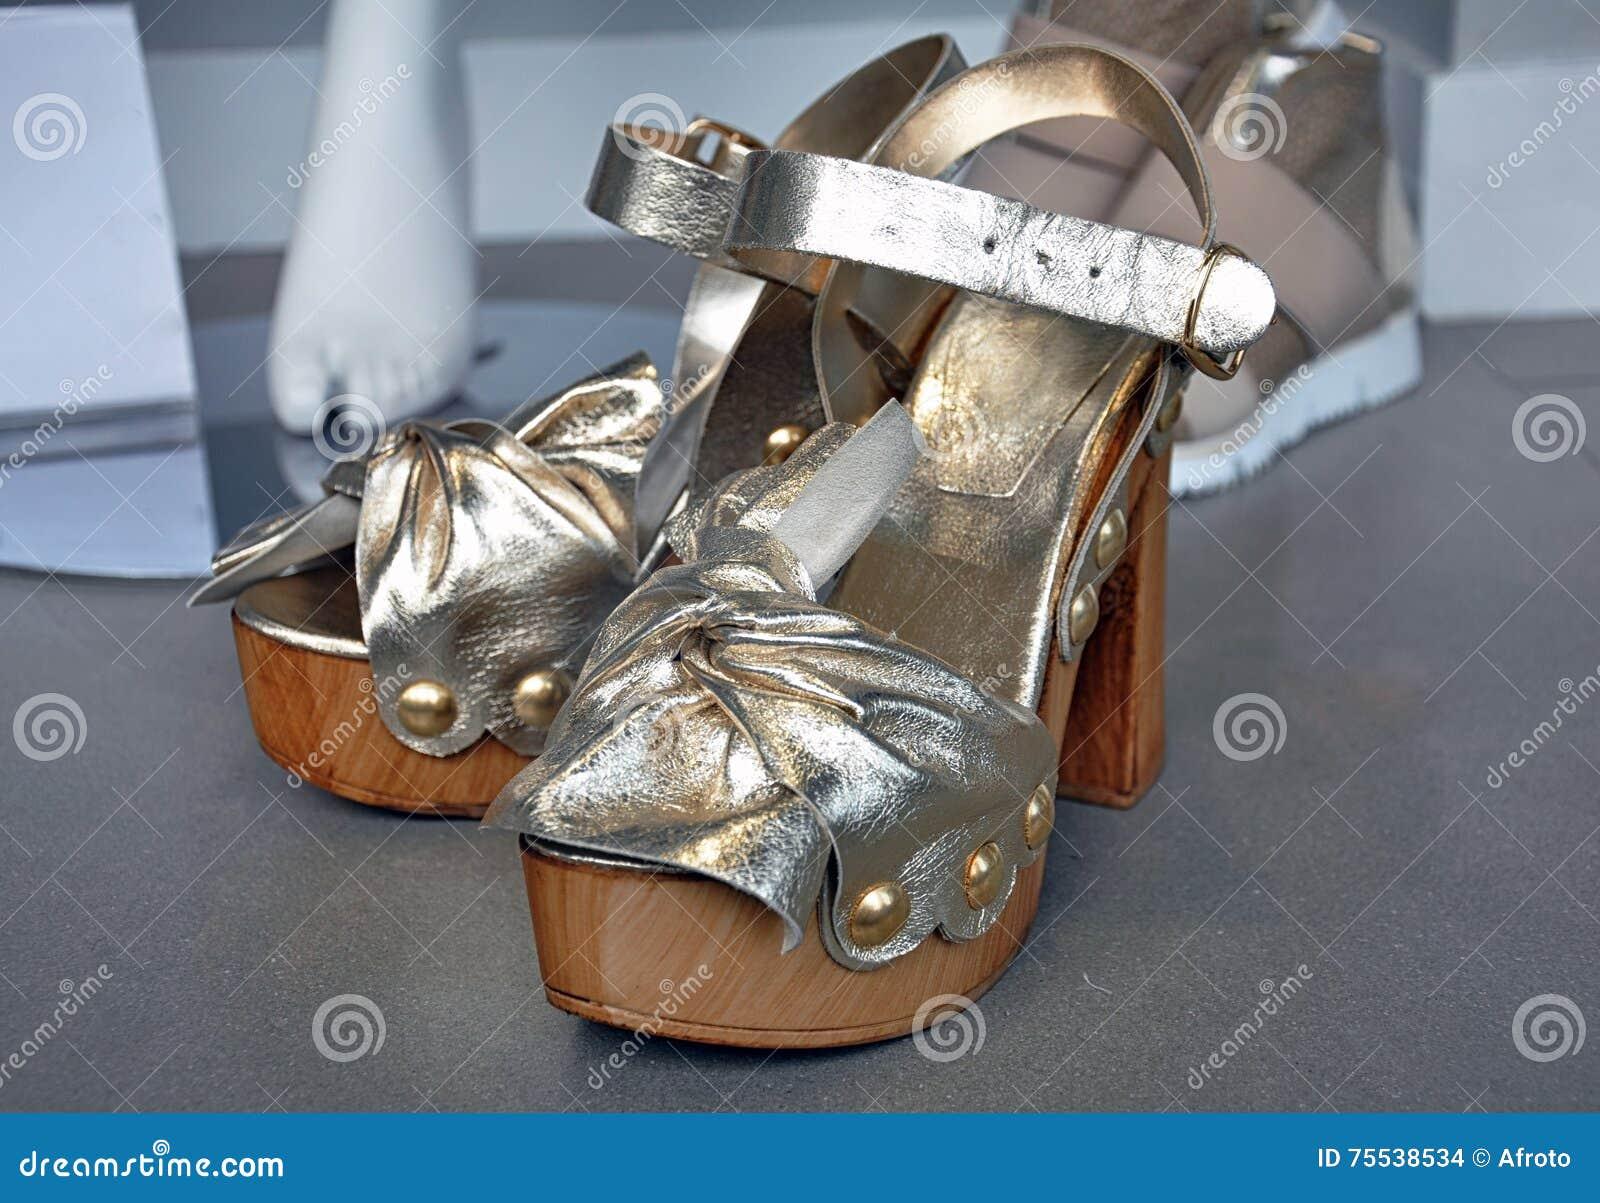 be5b69c9f14 Ασημένια υψηλά σανδάλια τακουνιών Στοκ Εικόνες - εικόνα από ...